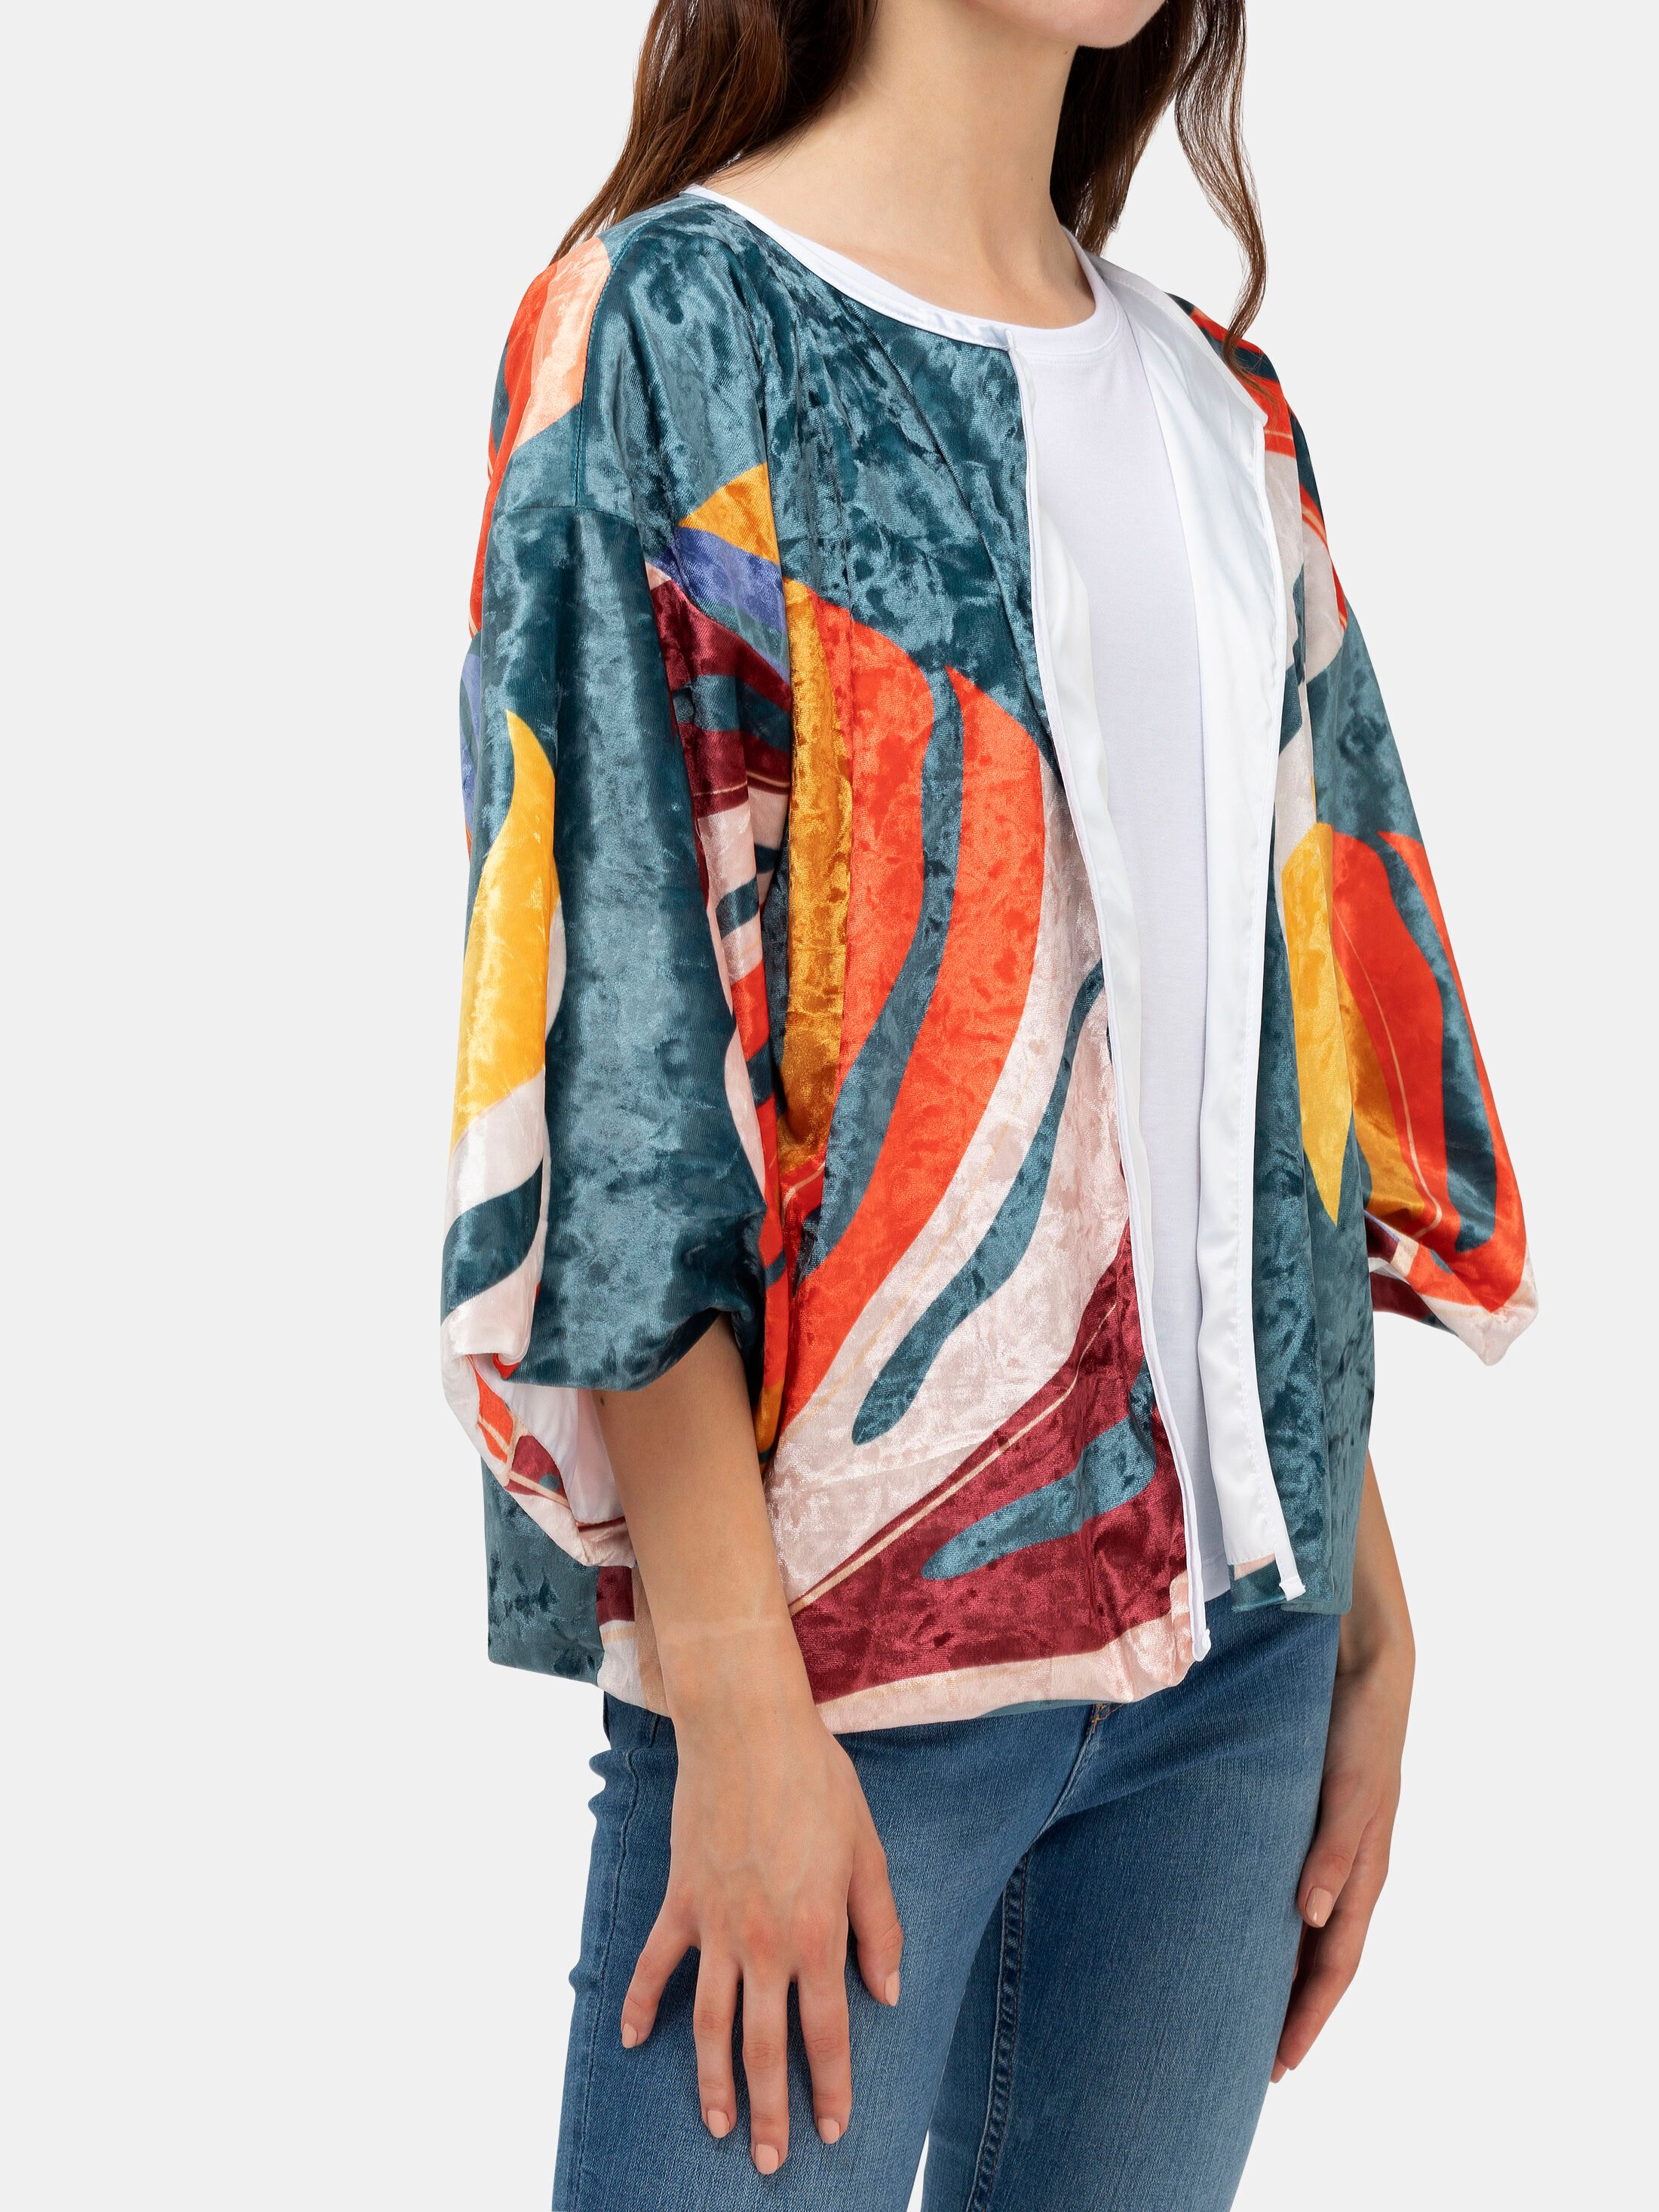 Gör din egna kimonojacka